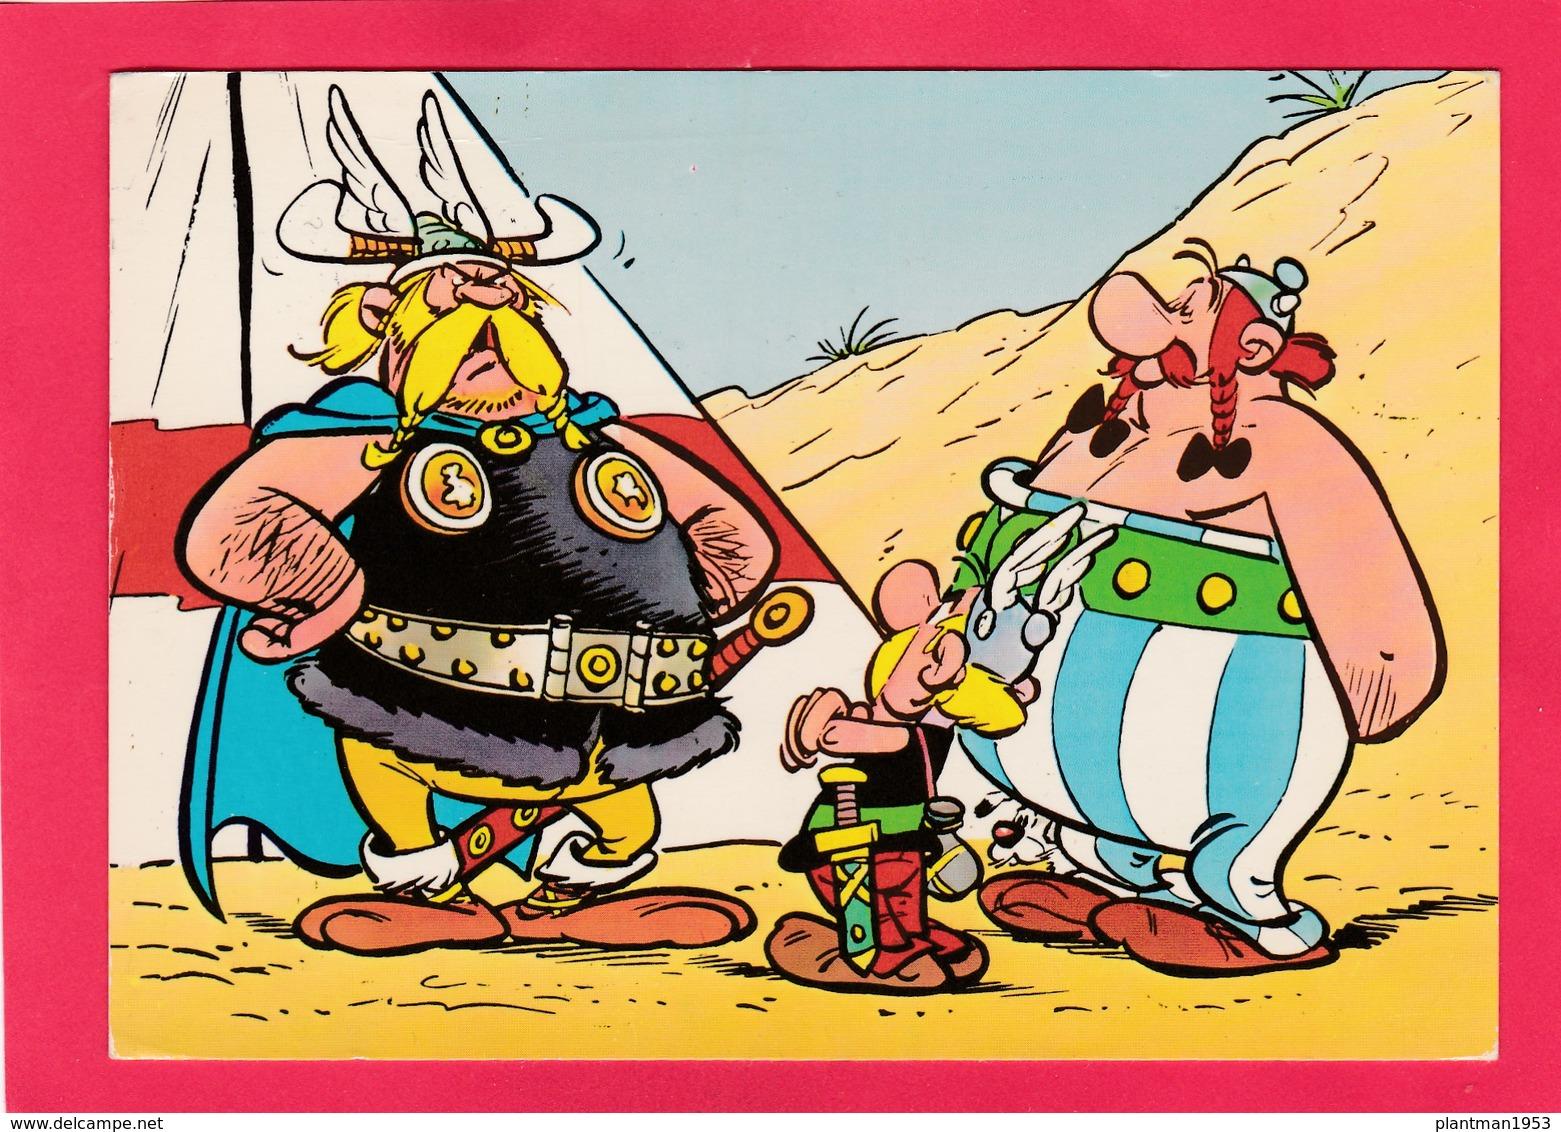 Modern Post Card Of Asterix Und Obelix Treffen Mit Maulaf, Germany,L54. - Germany